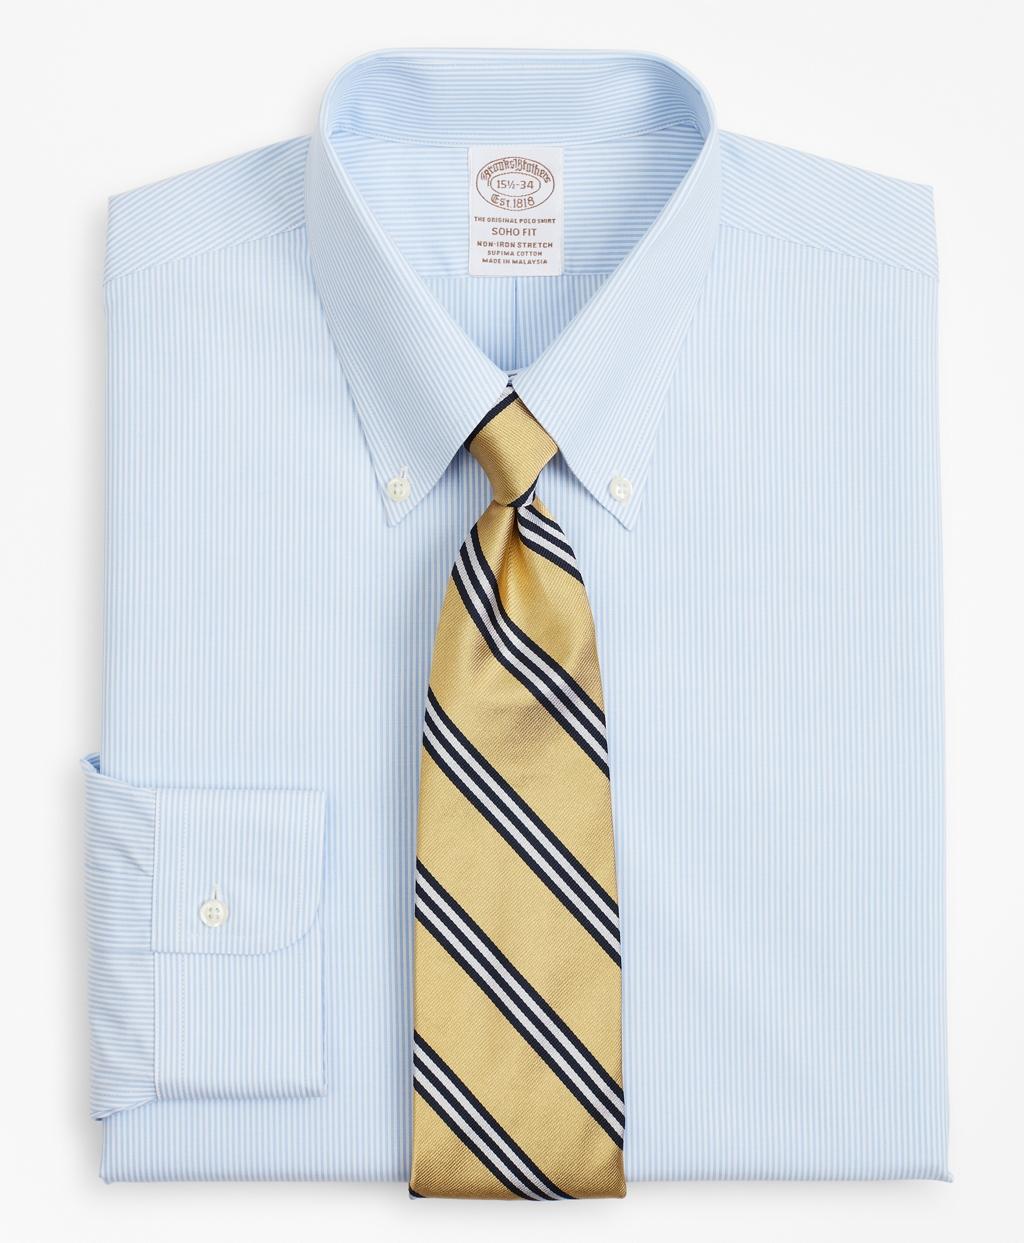 Brooksbrothers Stretch Soho Extra-Slim-Fit Dress Shirt, Non-Iron Poplin Button-Down Collar Fine Stripe